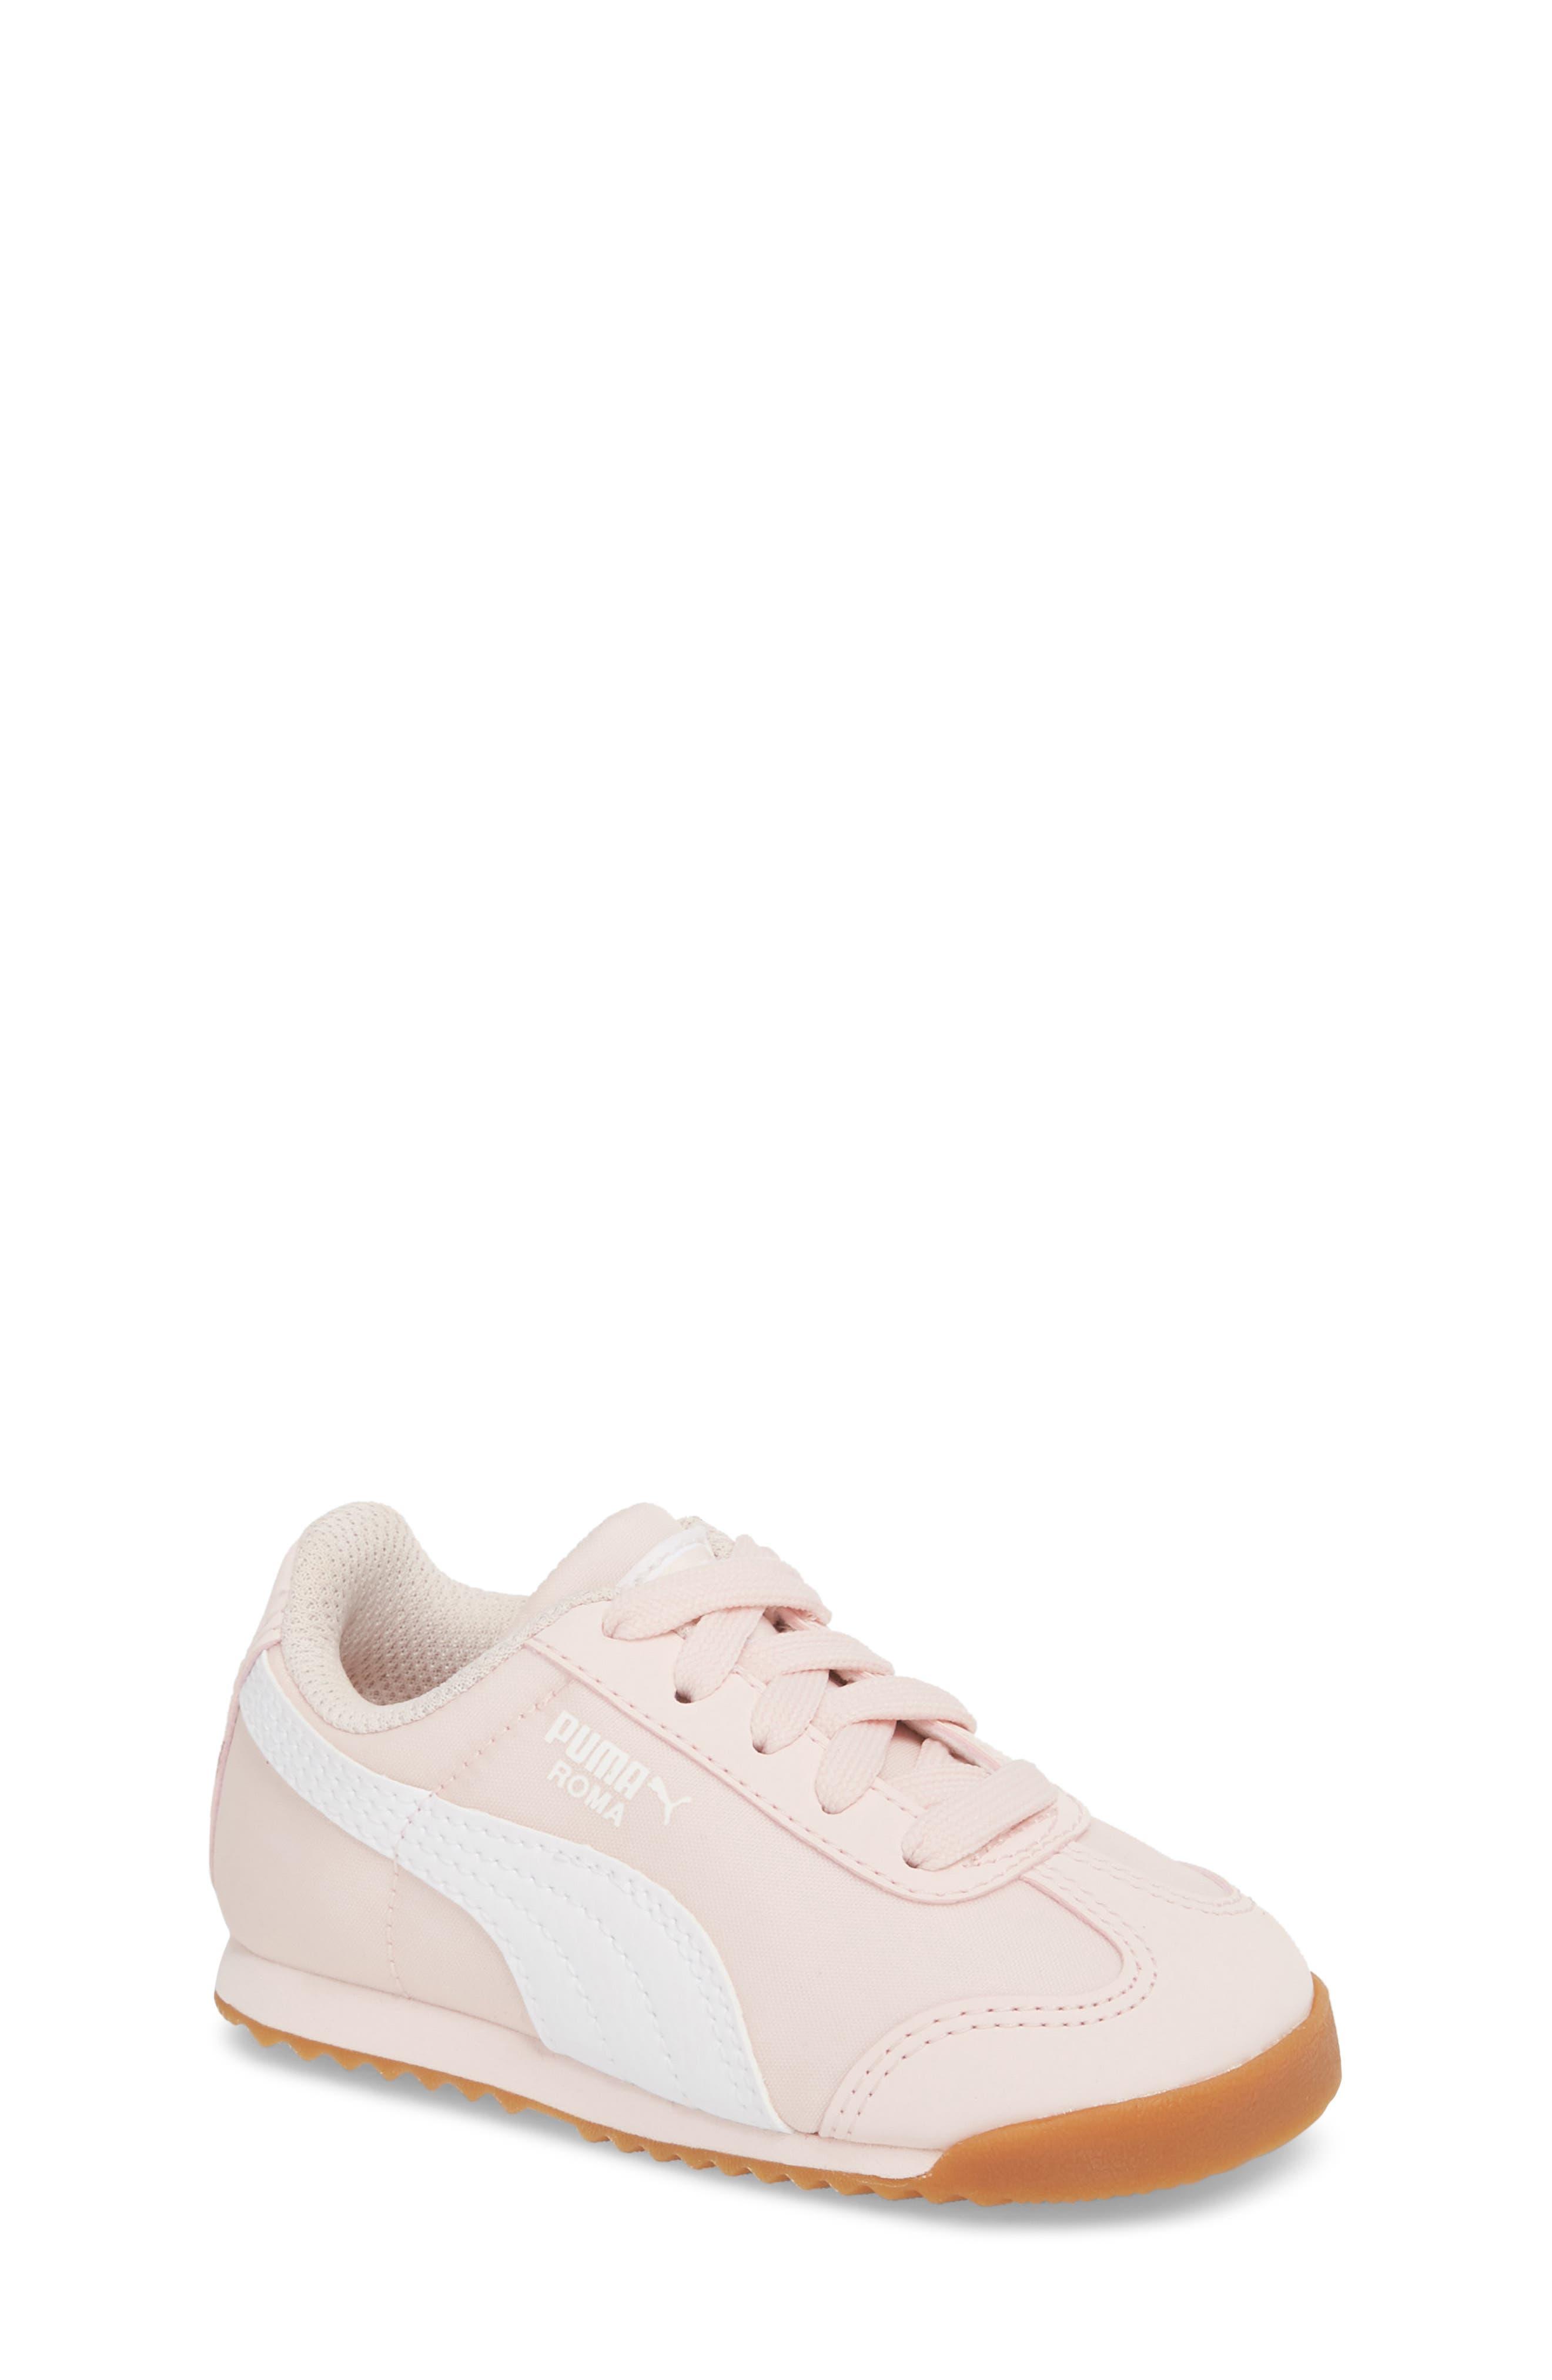 Roma Basic Summer Sneaker,                             Main thumbnail 1, color,                             Pearl/ White